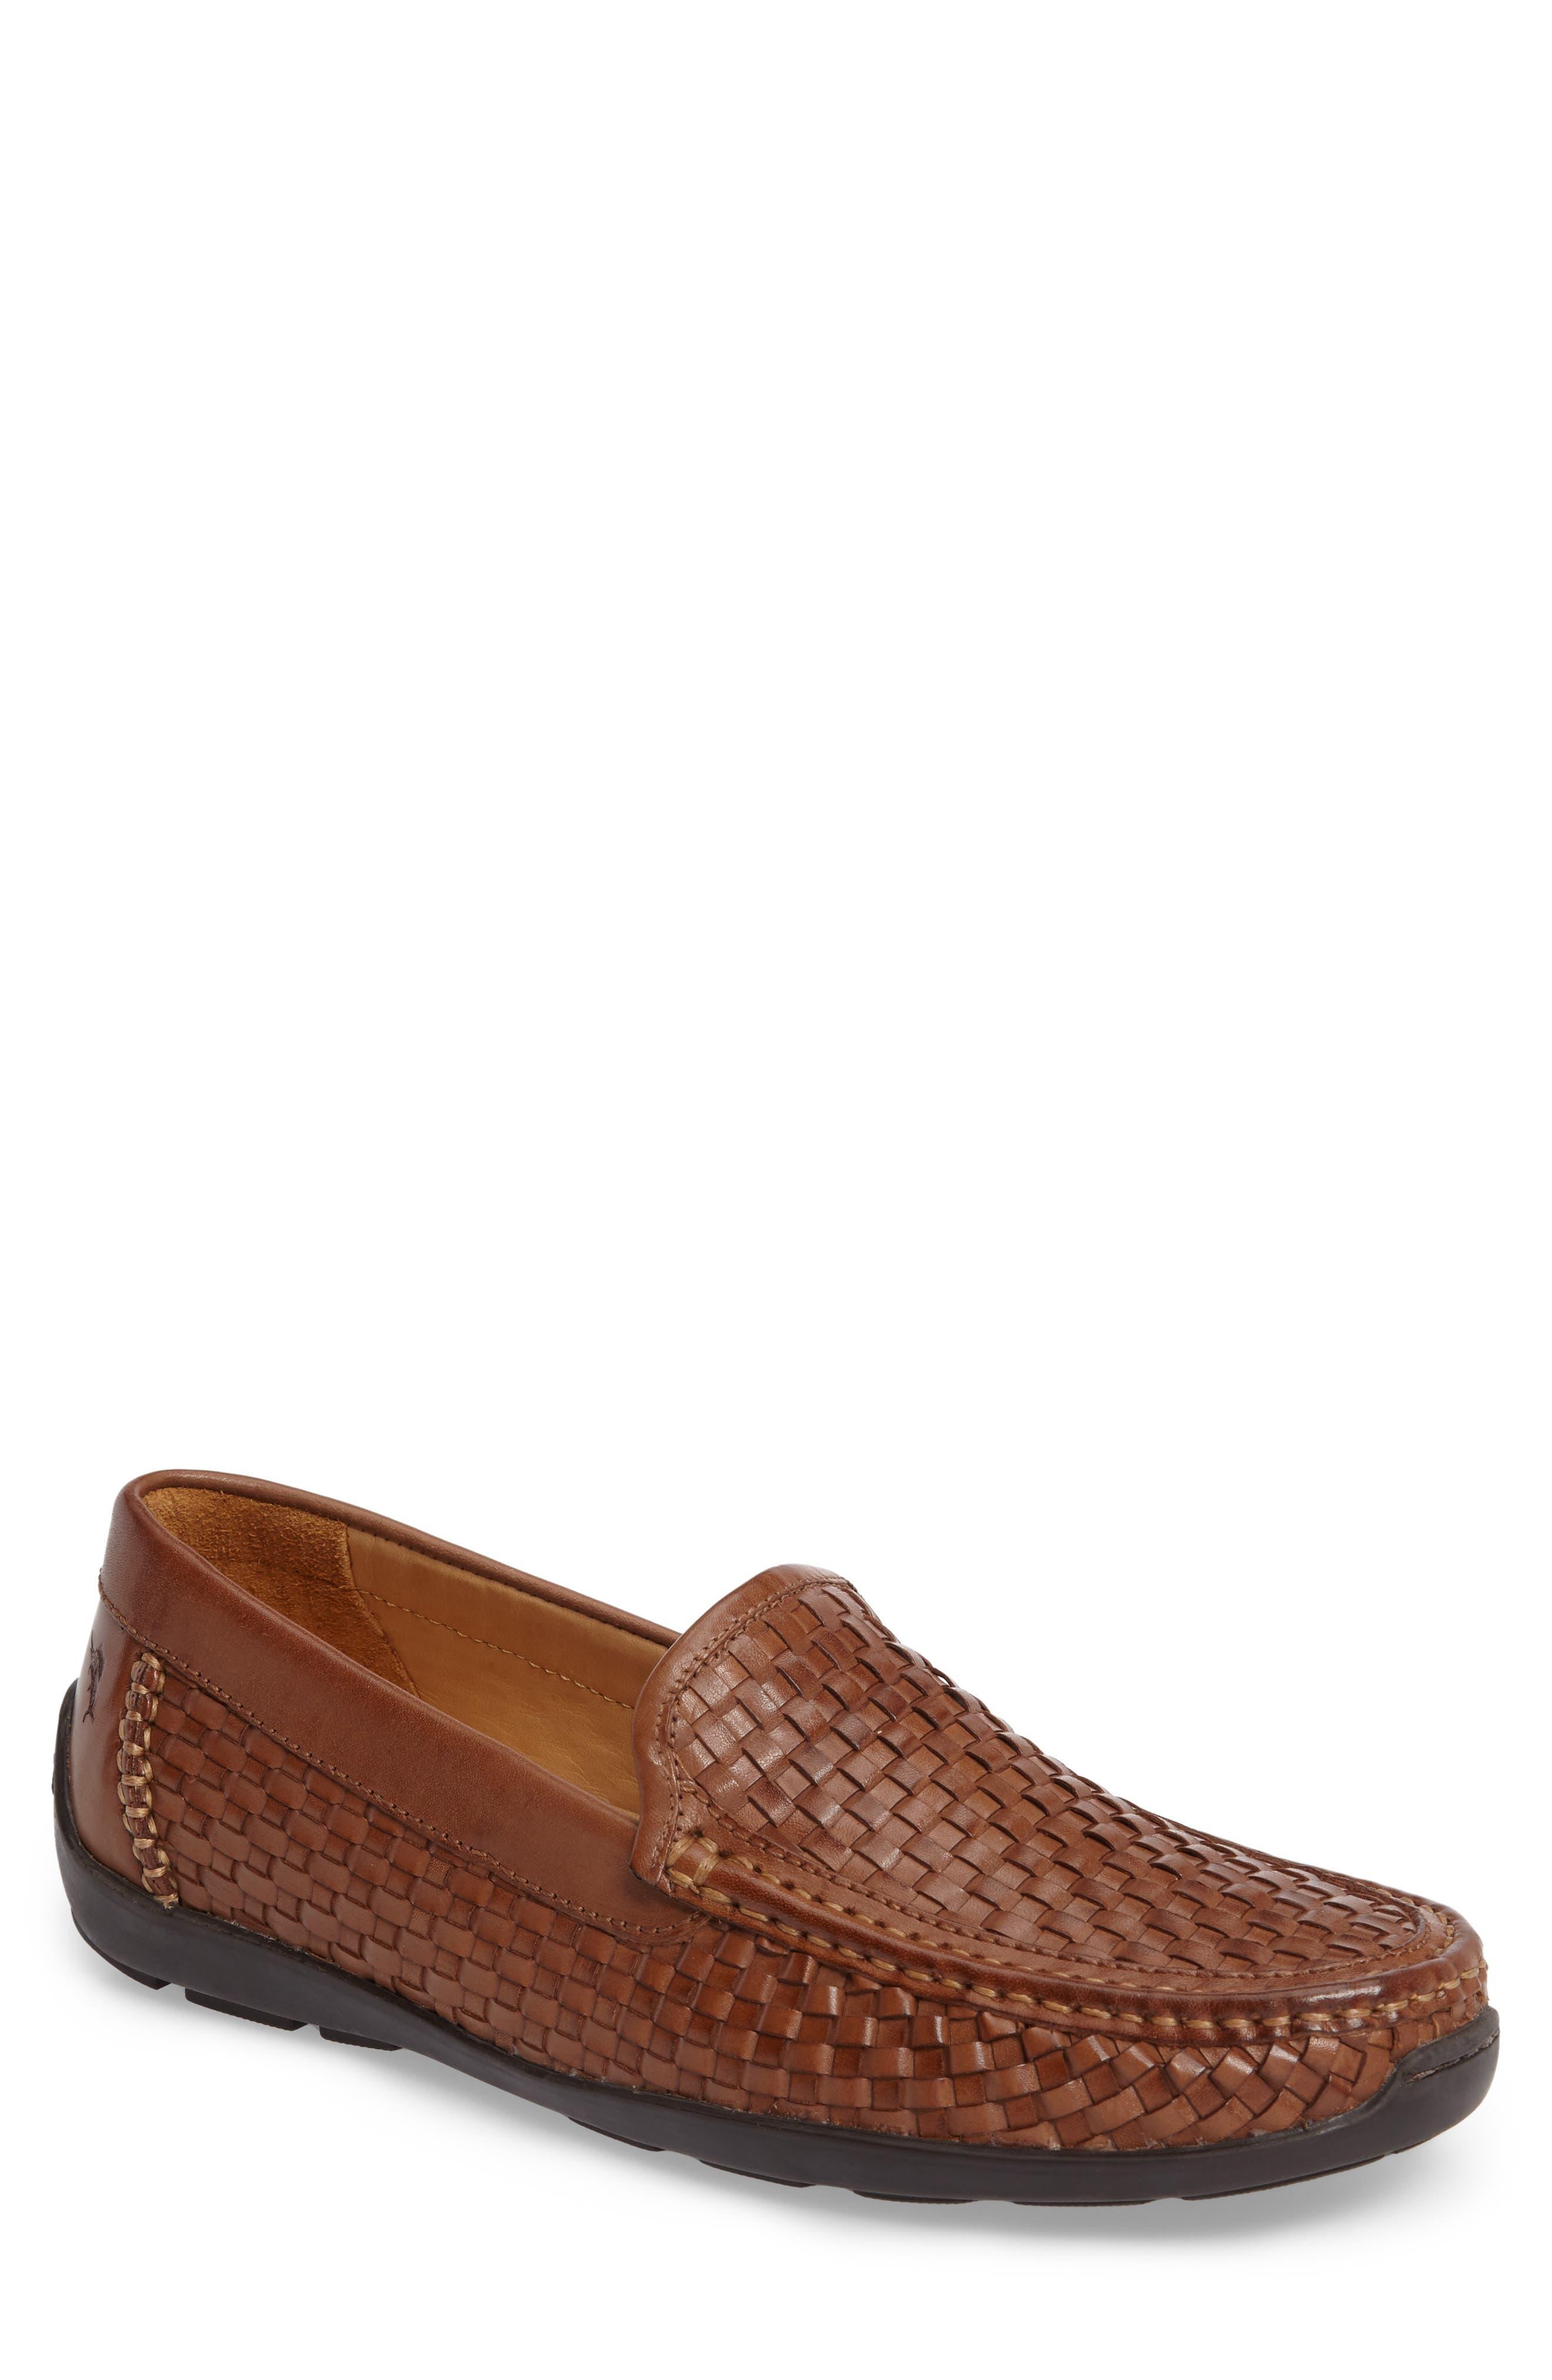 Alternate Image 1 Selected - Tommy Bahama Orson Driving Shoe (Men)